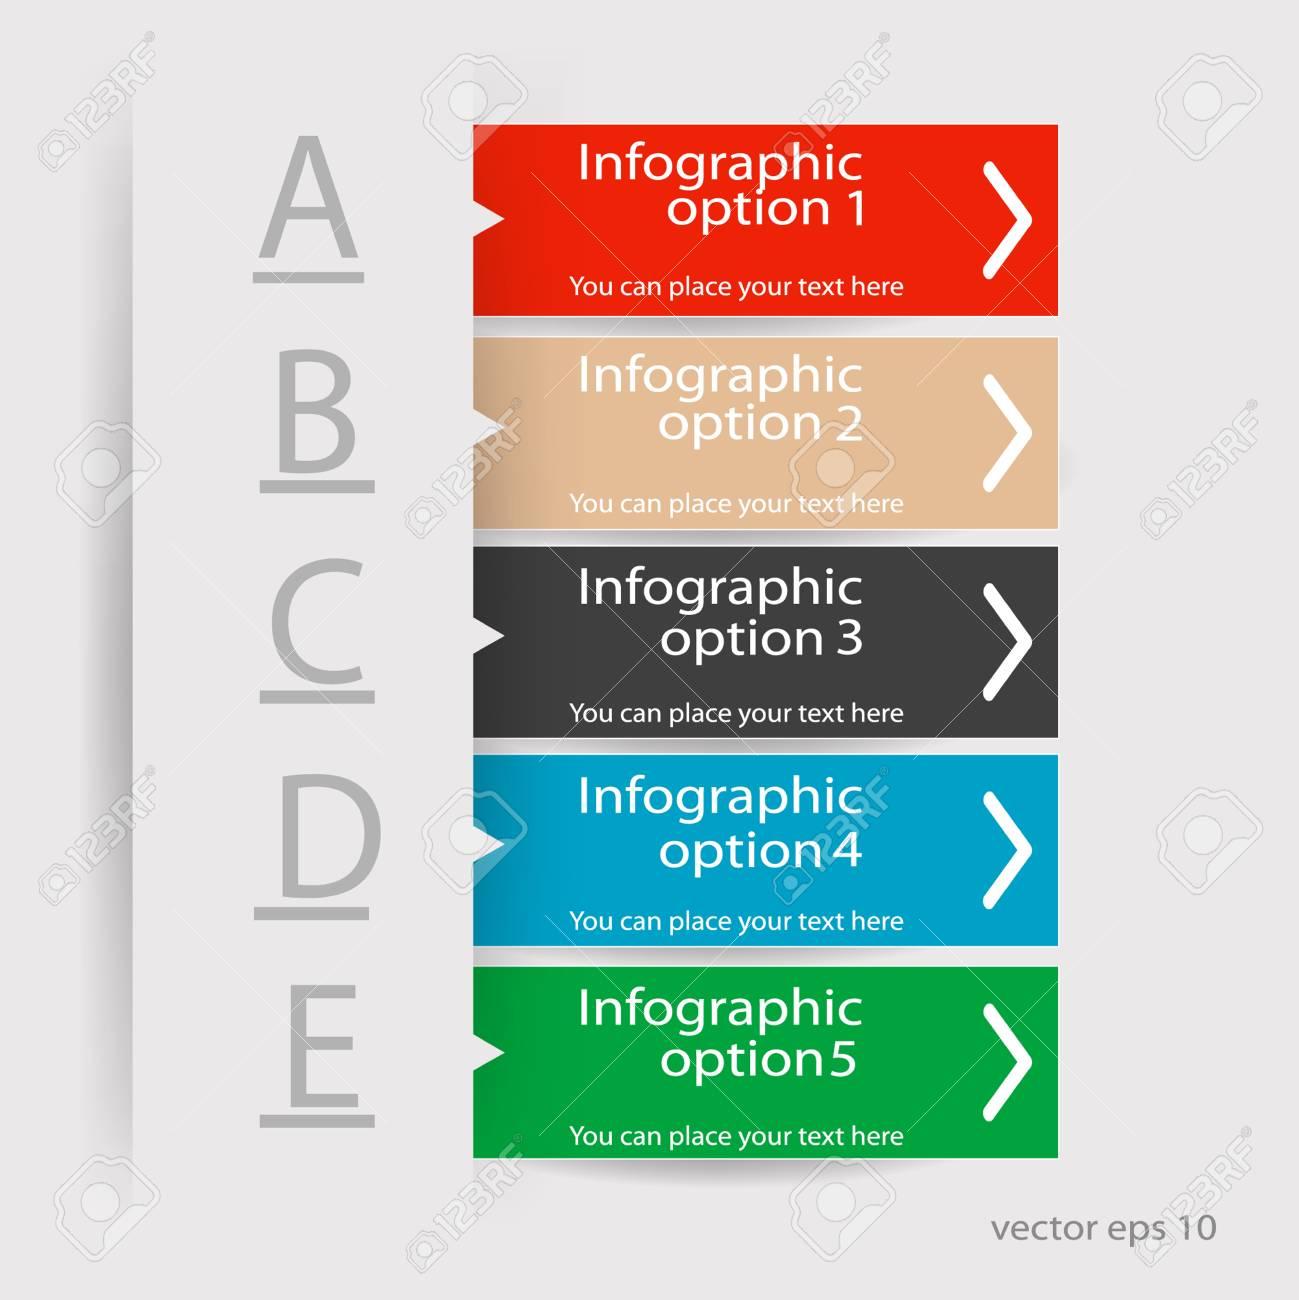 Infographic. Vector eps 10 Stock Vector - 24892448